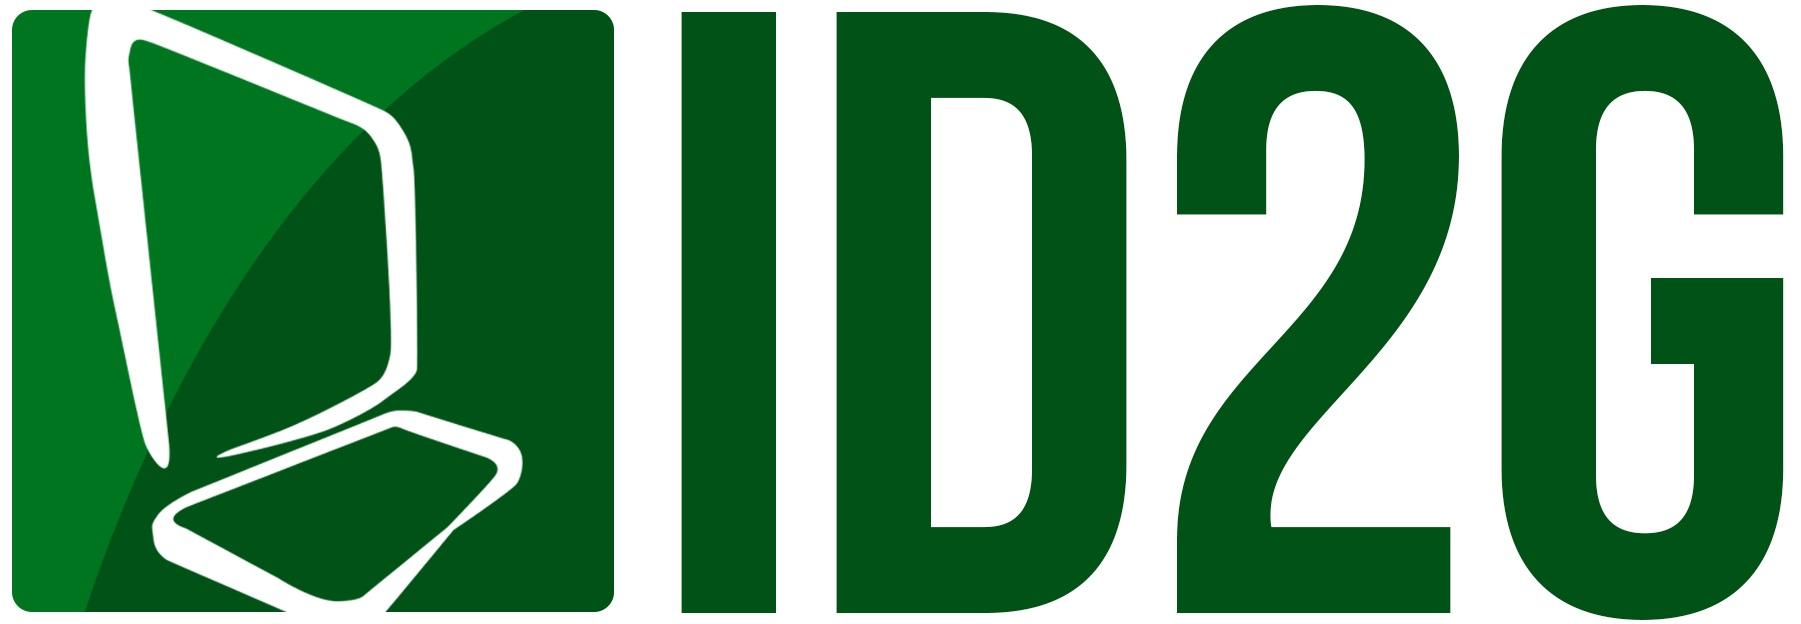 Informatique   Maintenance   Assistance   ID2G